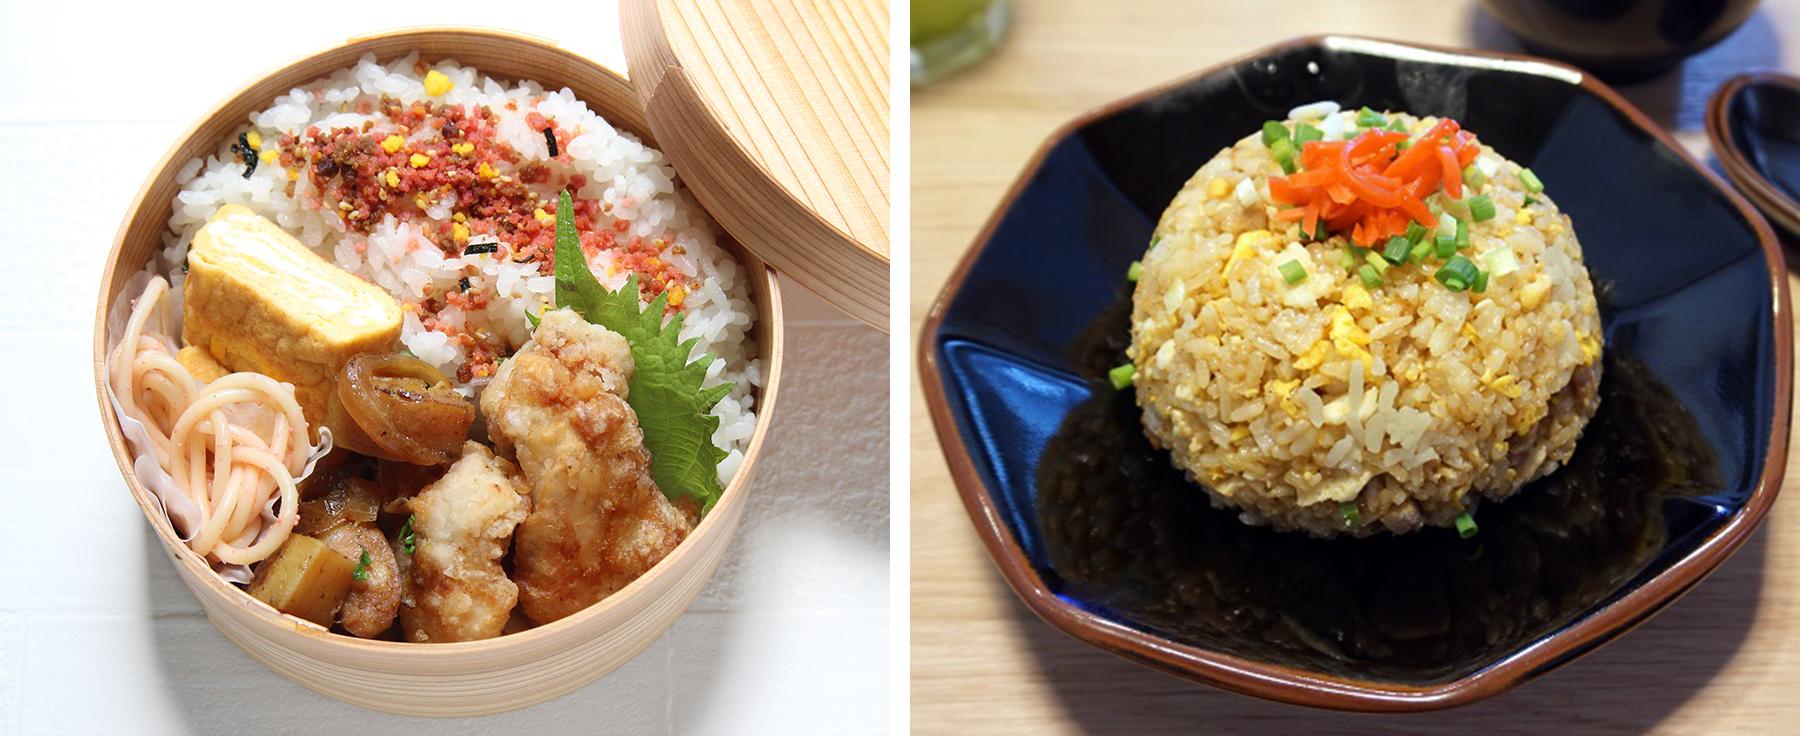 furikake in bento and fried rice